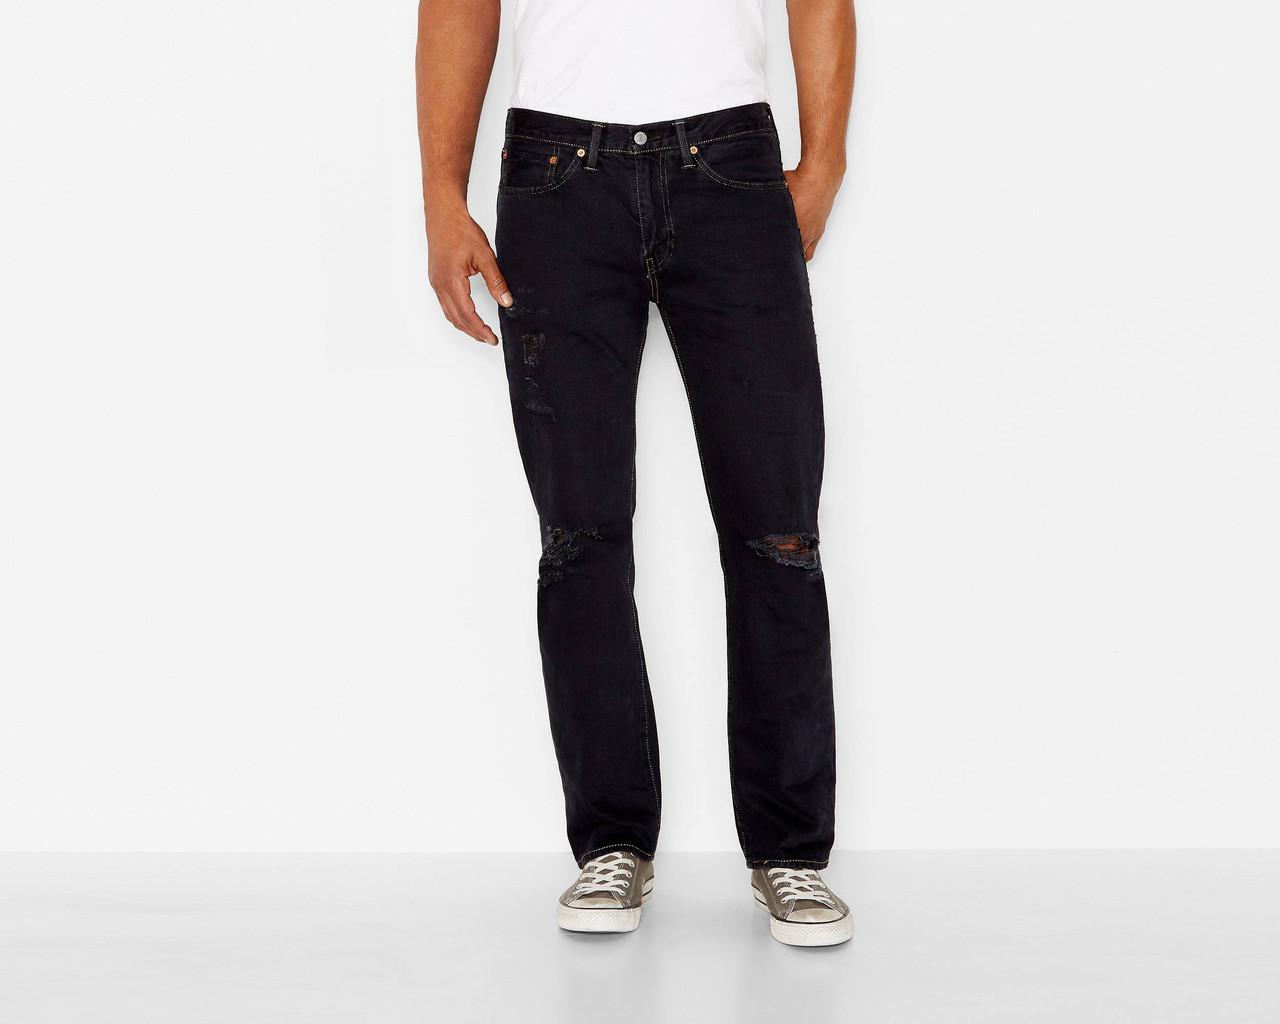 Джинсы Levi's 514 Straight Fit, Black Dell, 34W34L, 005140759, фото 1